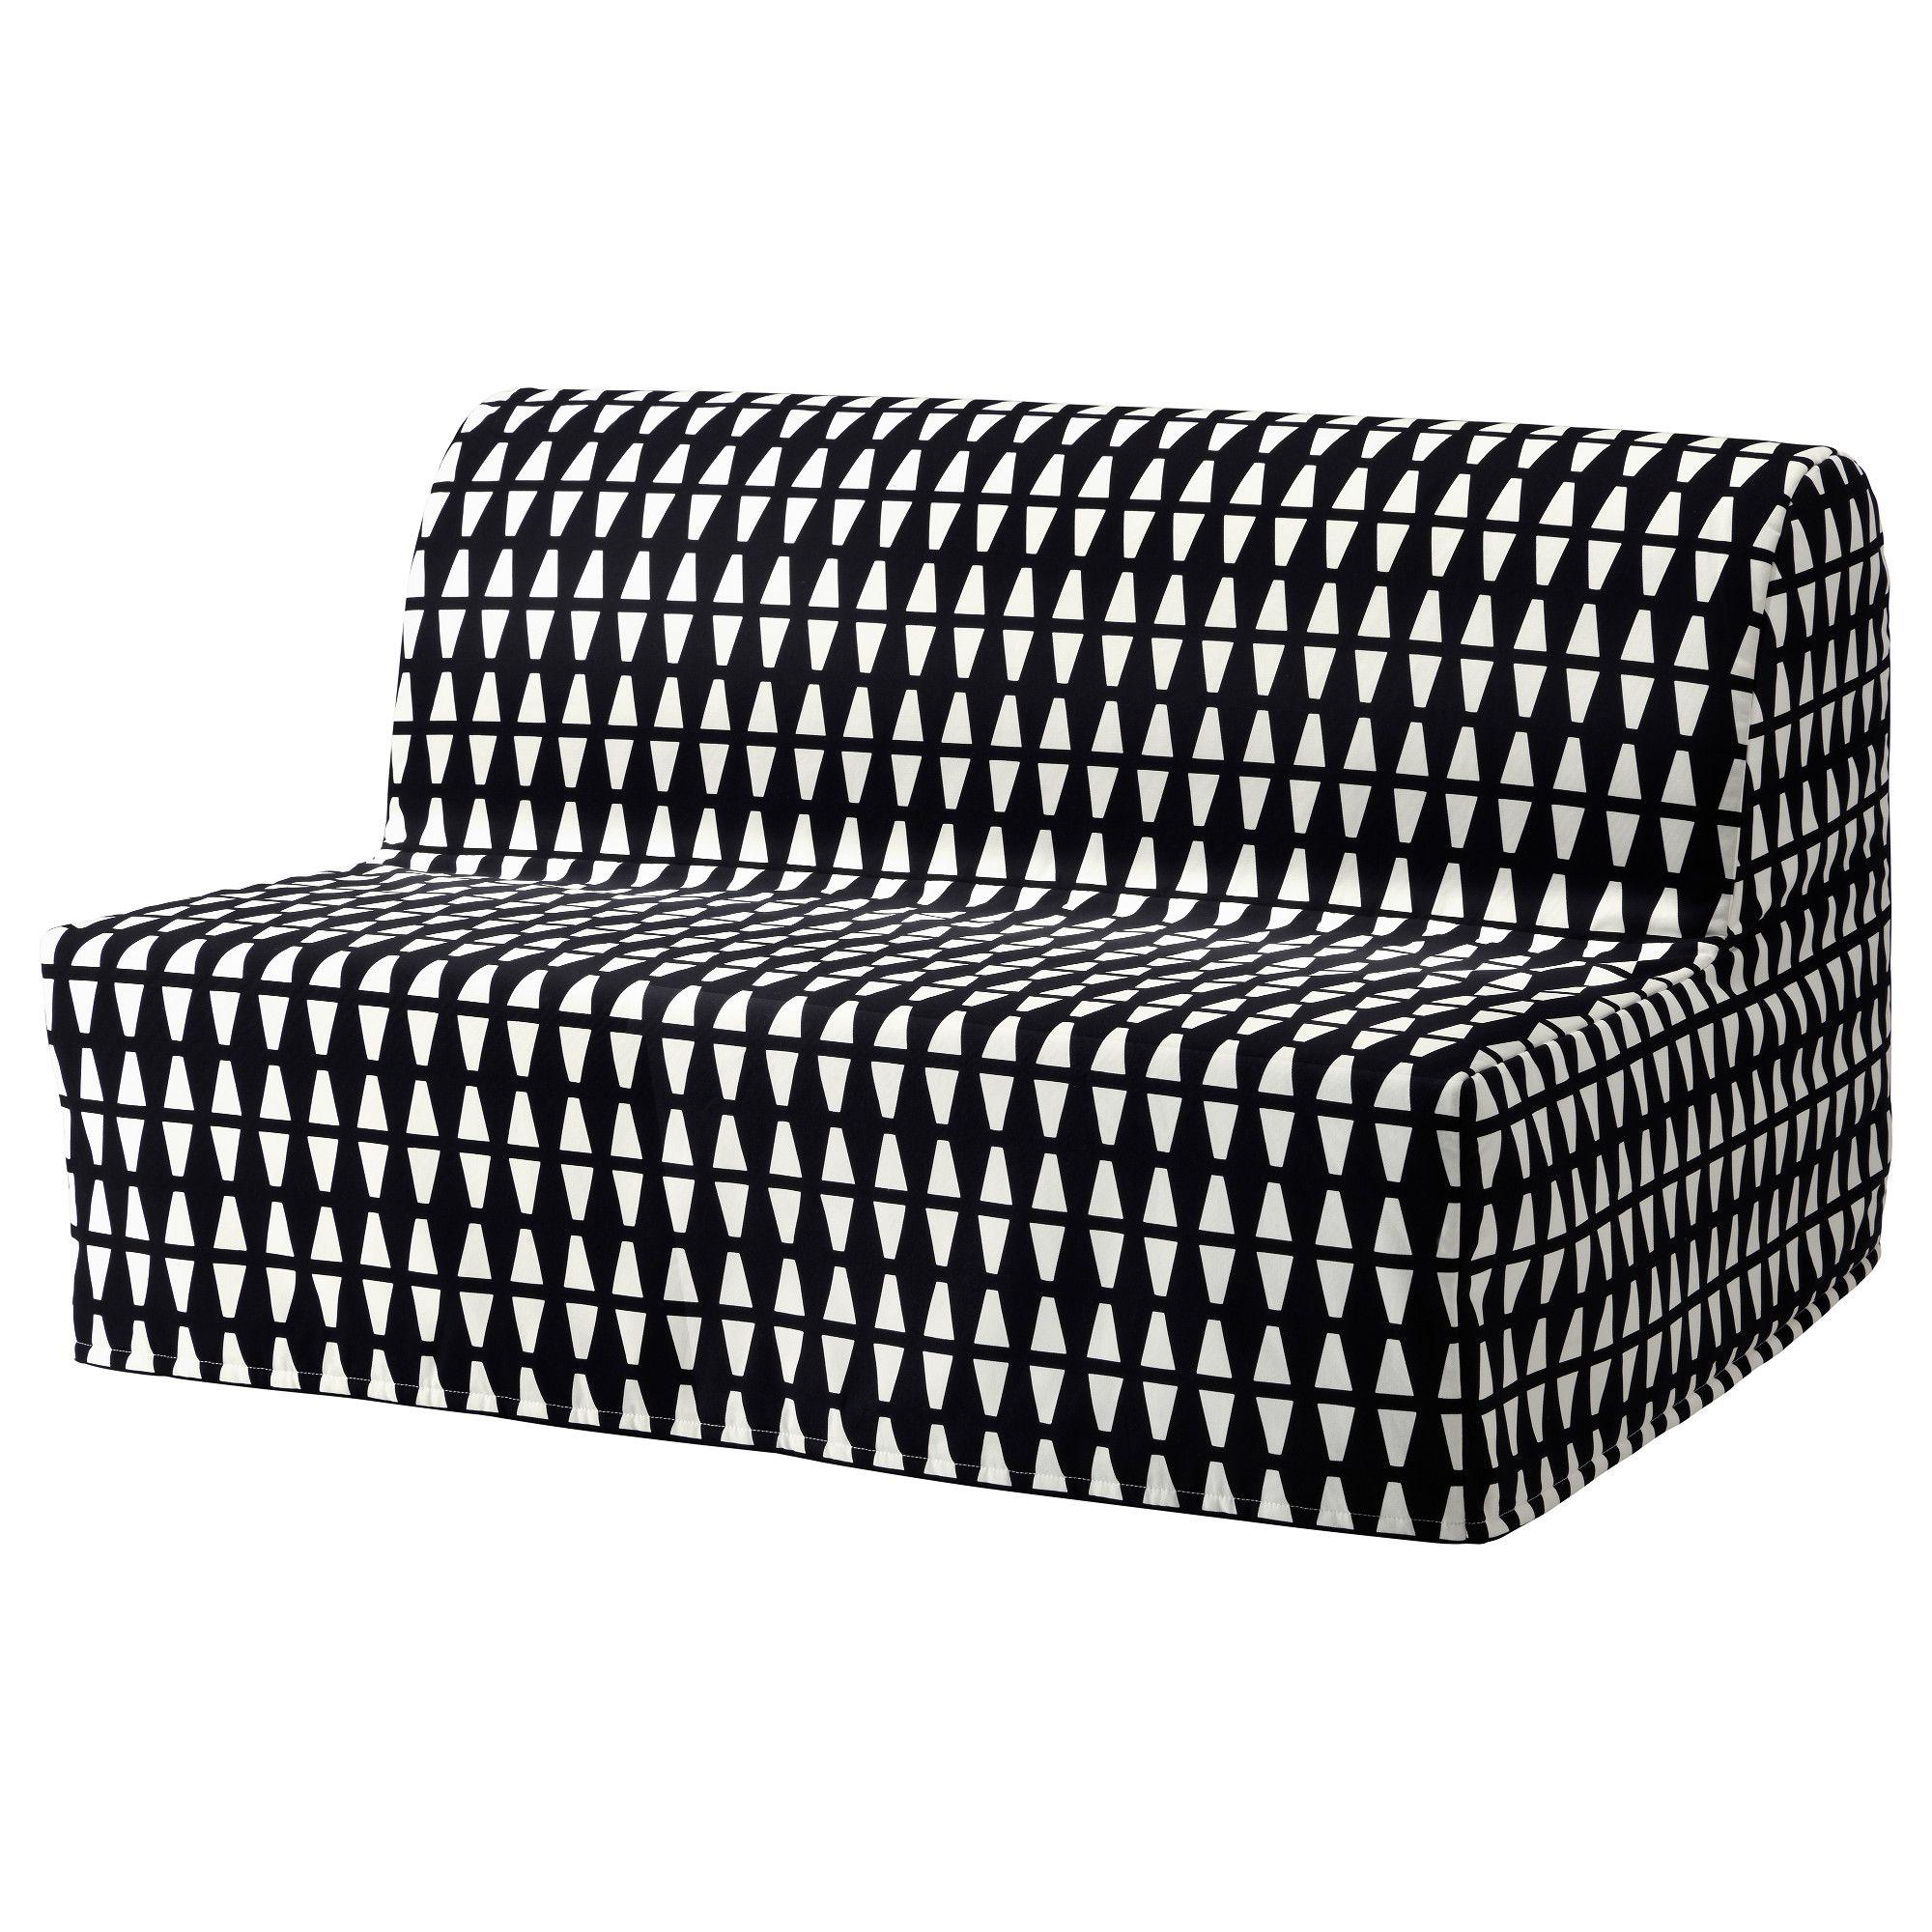 LYCKSELE LÖVÅS Sleeper sofa Ebbarp black/white